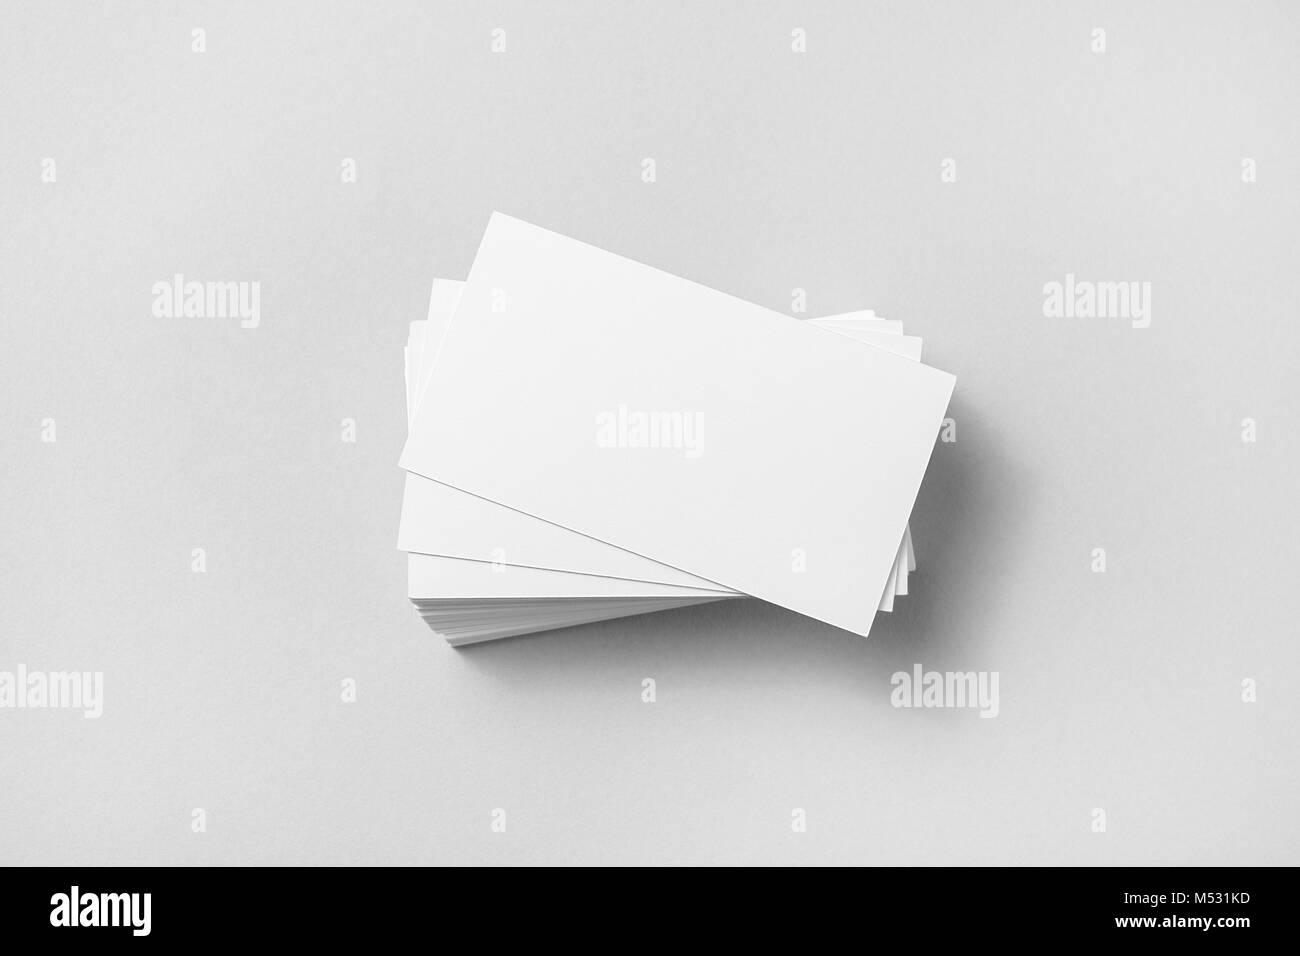 Blank business cards Stock Photo: 175244145 - Alamy